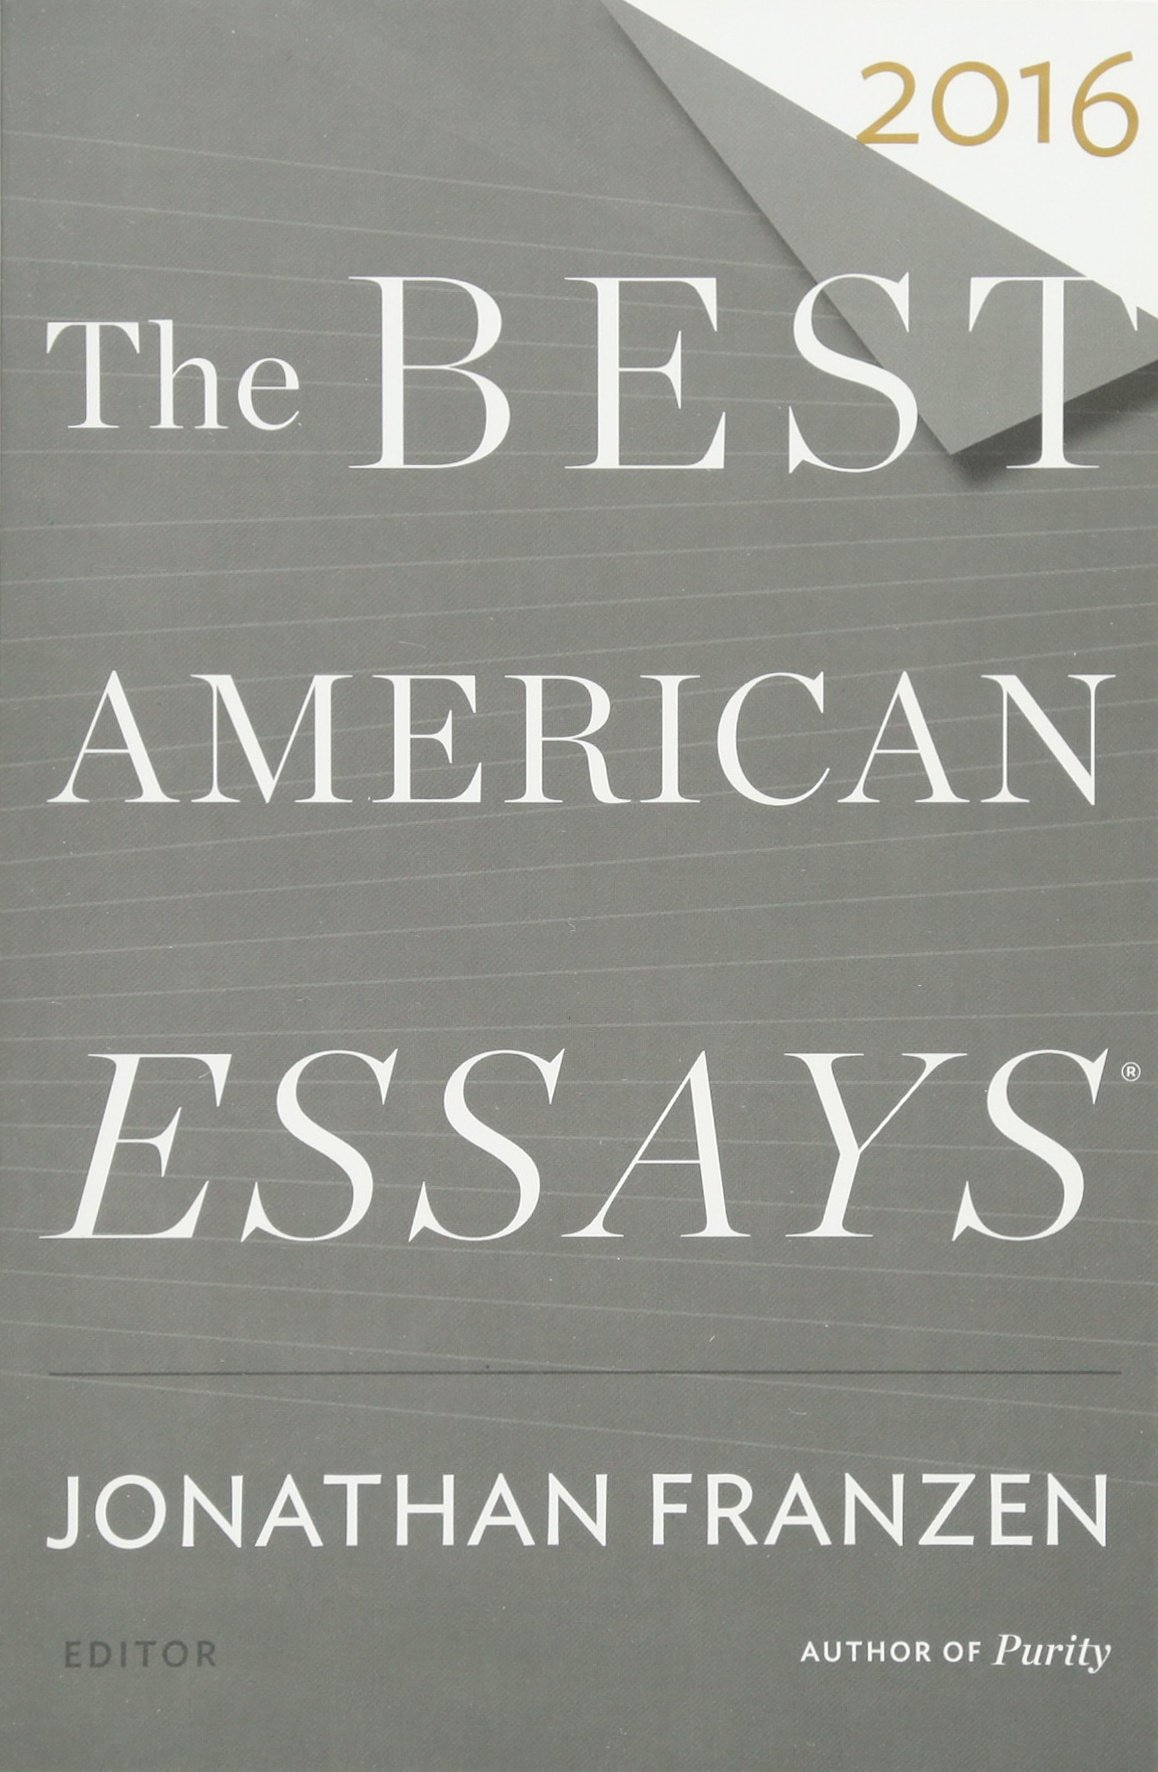 001 71a6bhsgsdl Essay Example Best Essays Breathtaking 2016 Personal College Australian Full